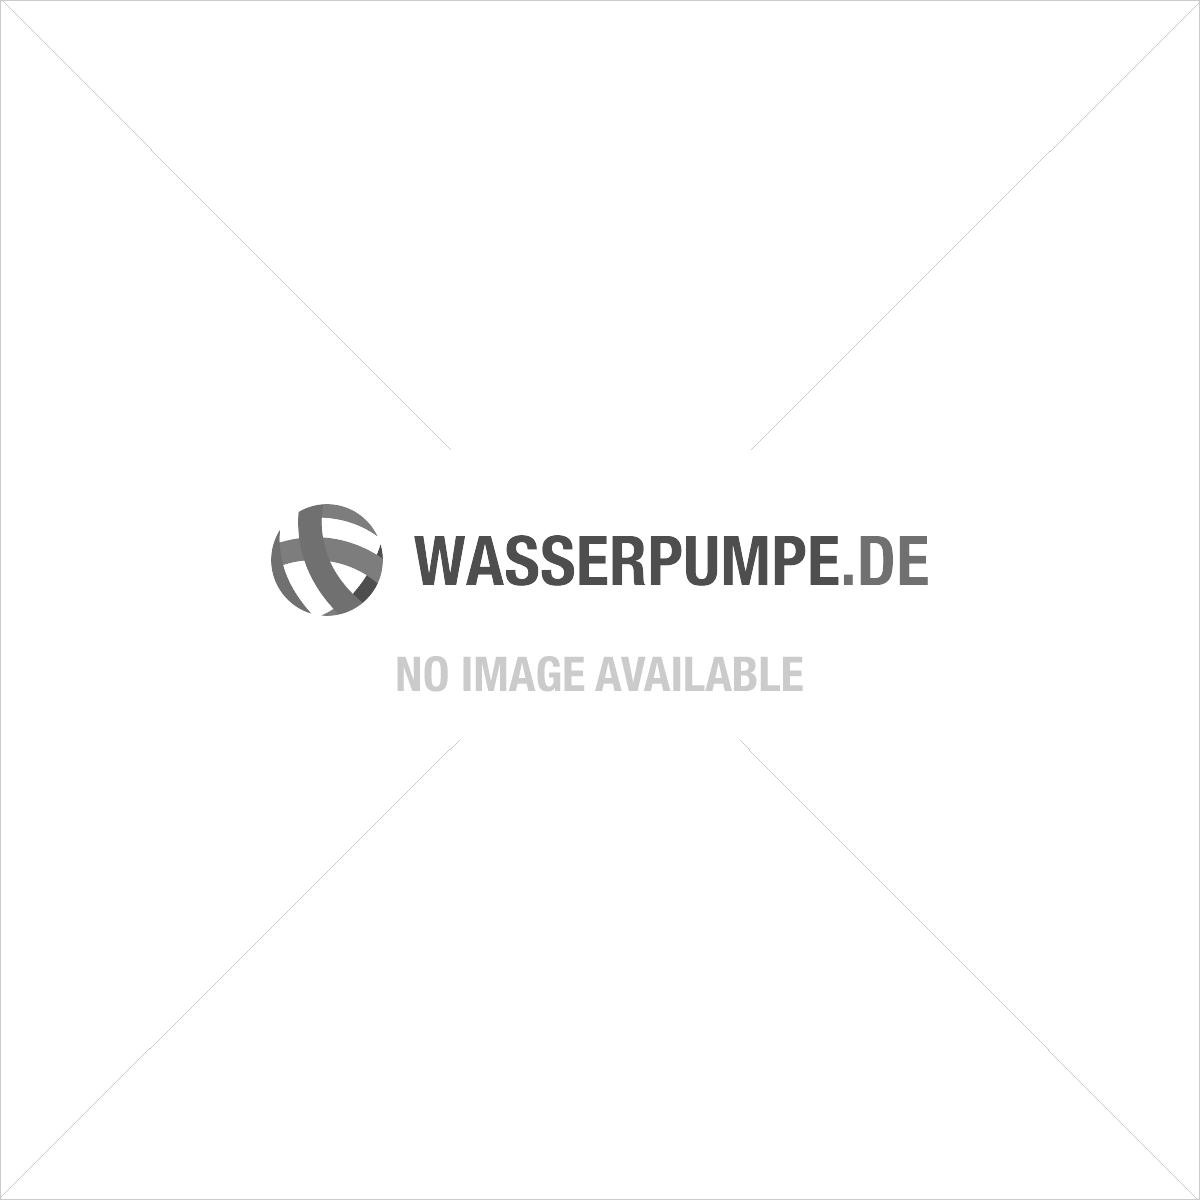 DAB Fekabox 200 Abfallwasserhebeanlage Pro-Paket